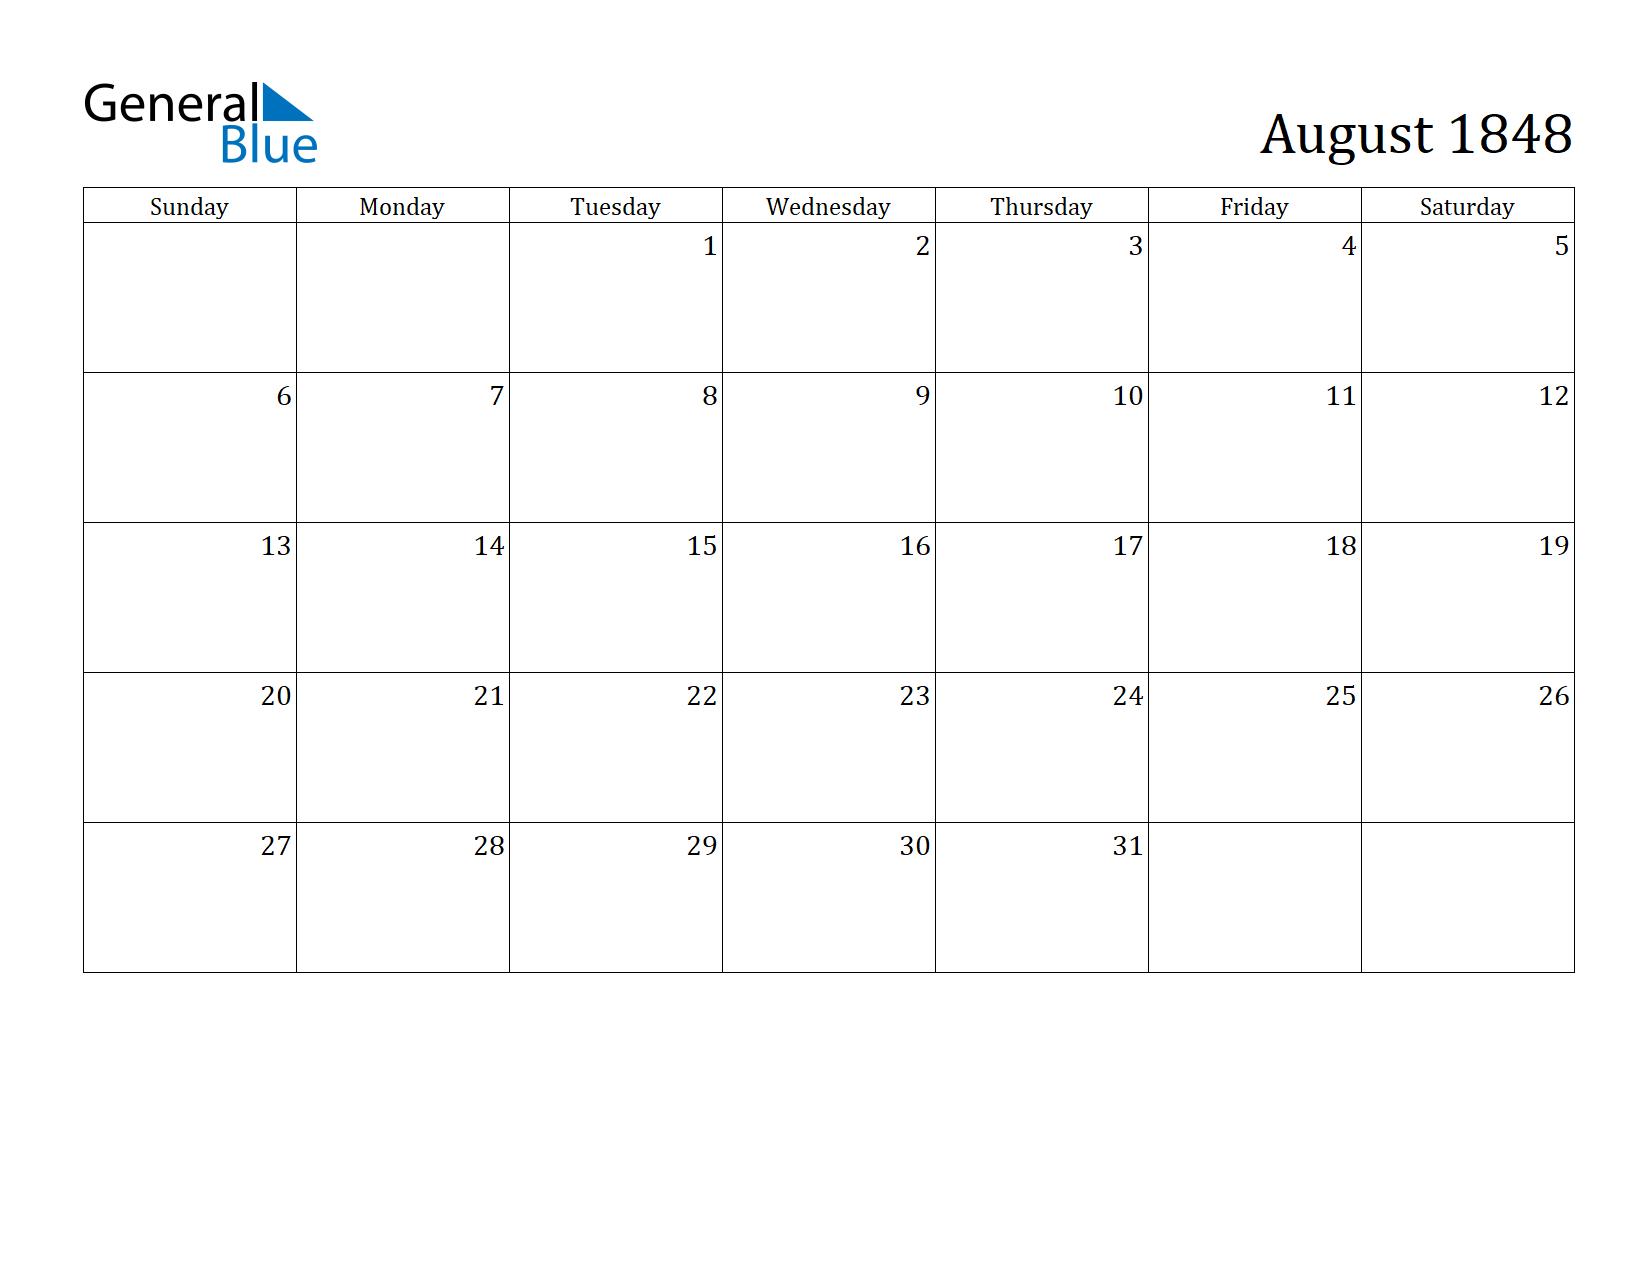 Image of August 1848 Calendar